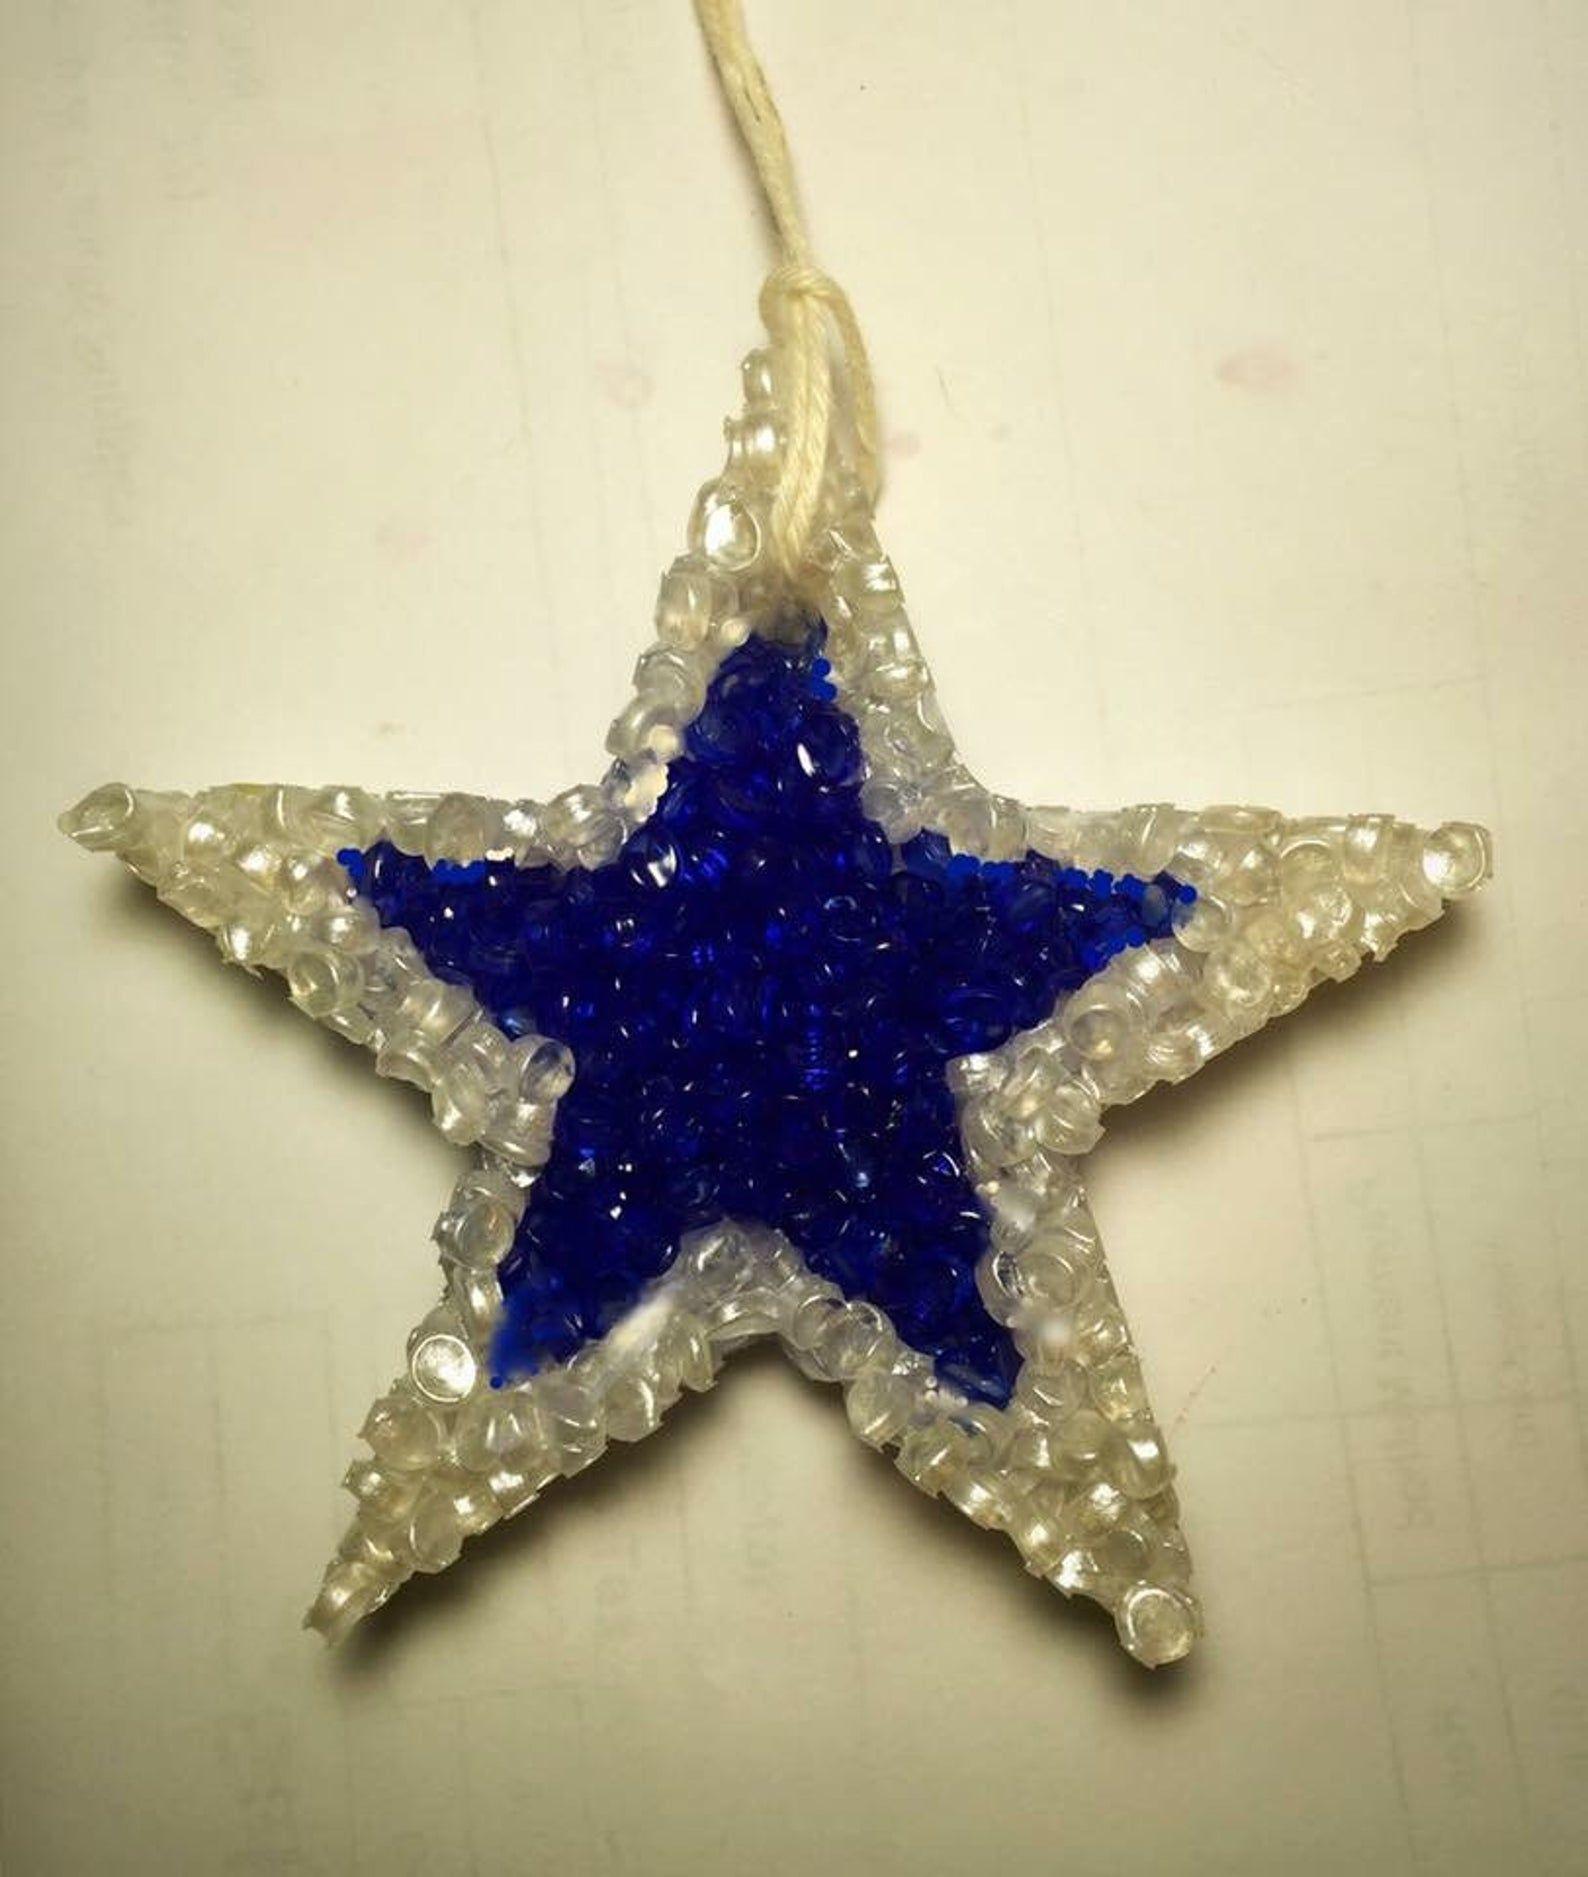 Cowboys Star Air Freshener, Aroma Beads, Ornies, Car Air